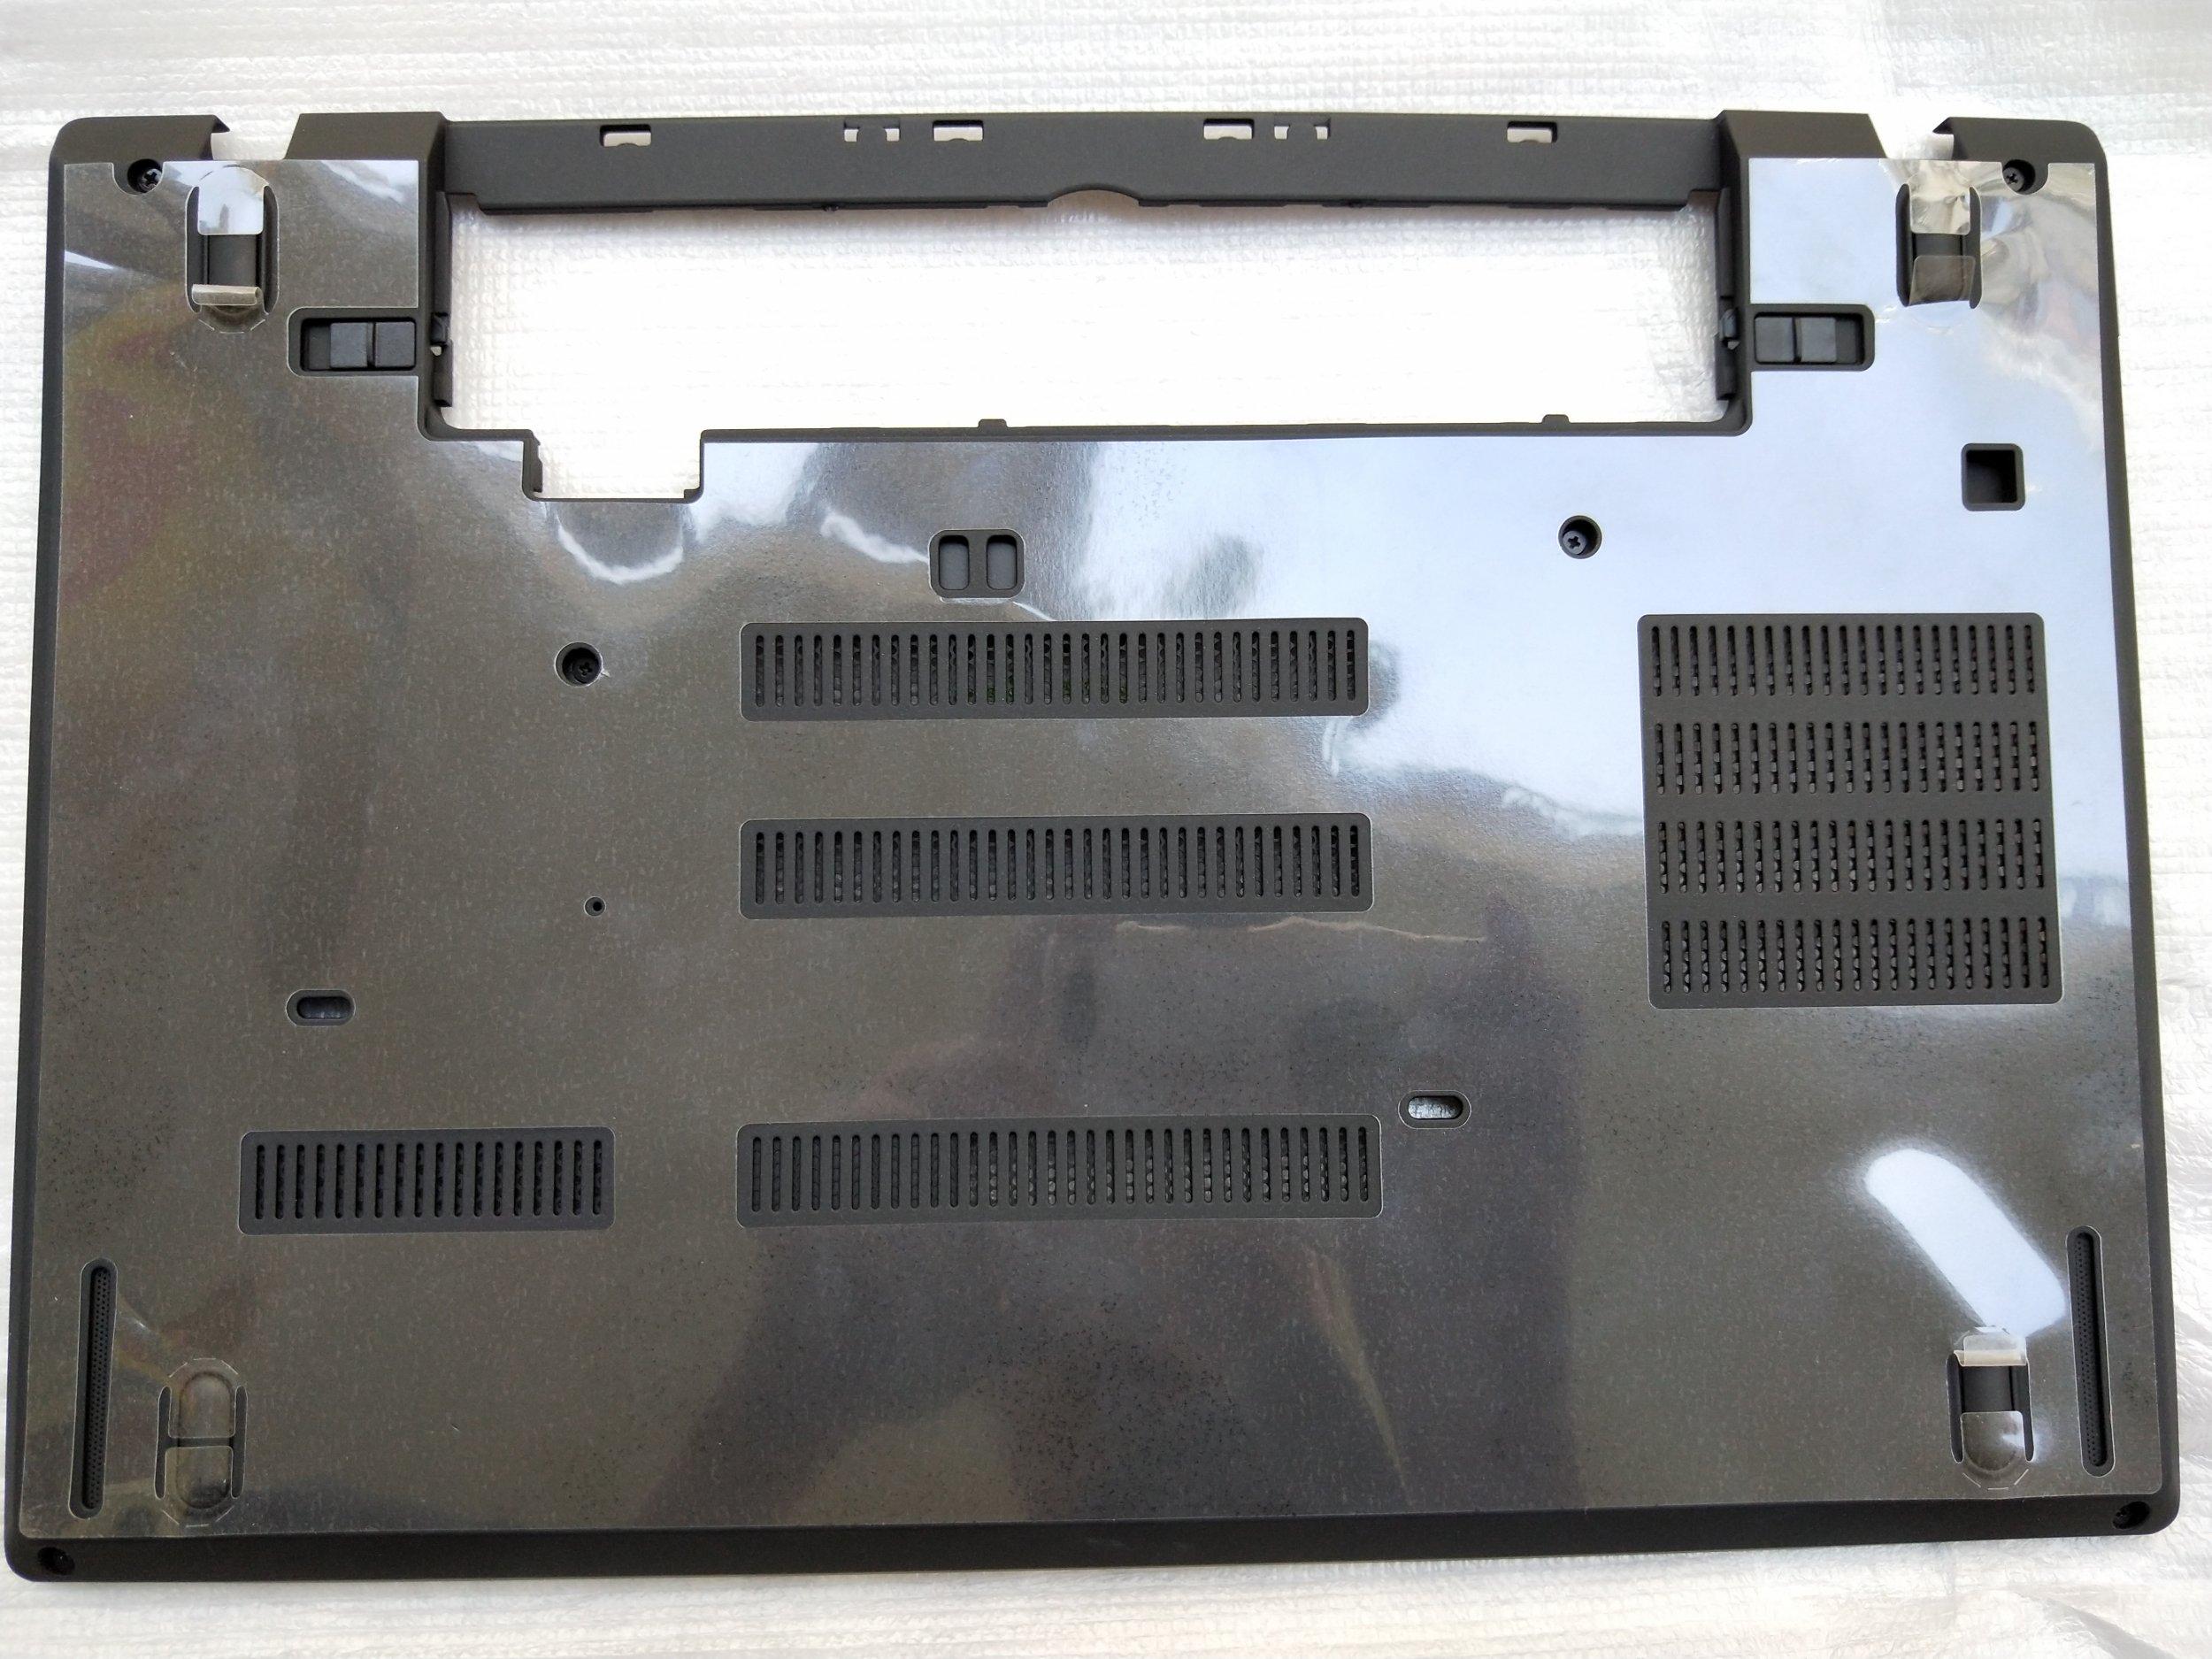 New Original case for Lenovo Thinkpad T480 Base Case Bottom Cover Assembly 01YR485 AP169000600 BLACK